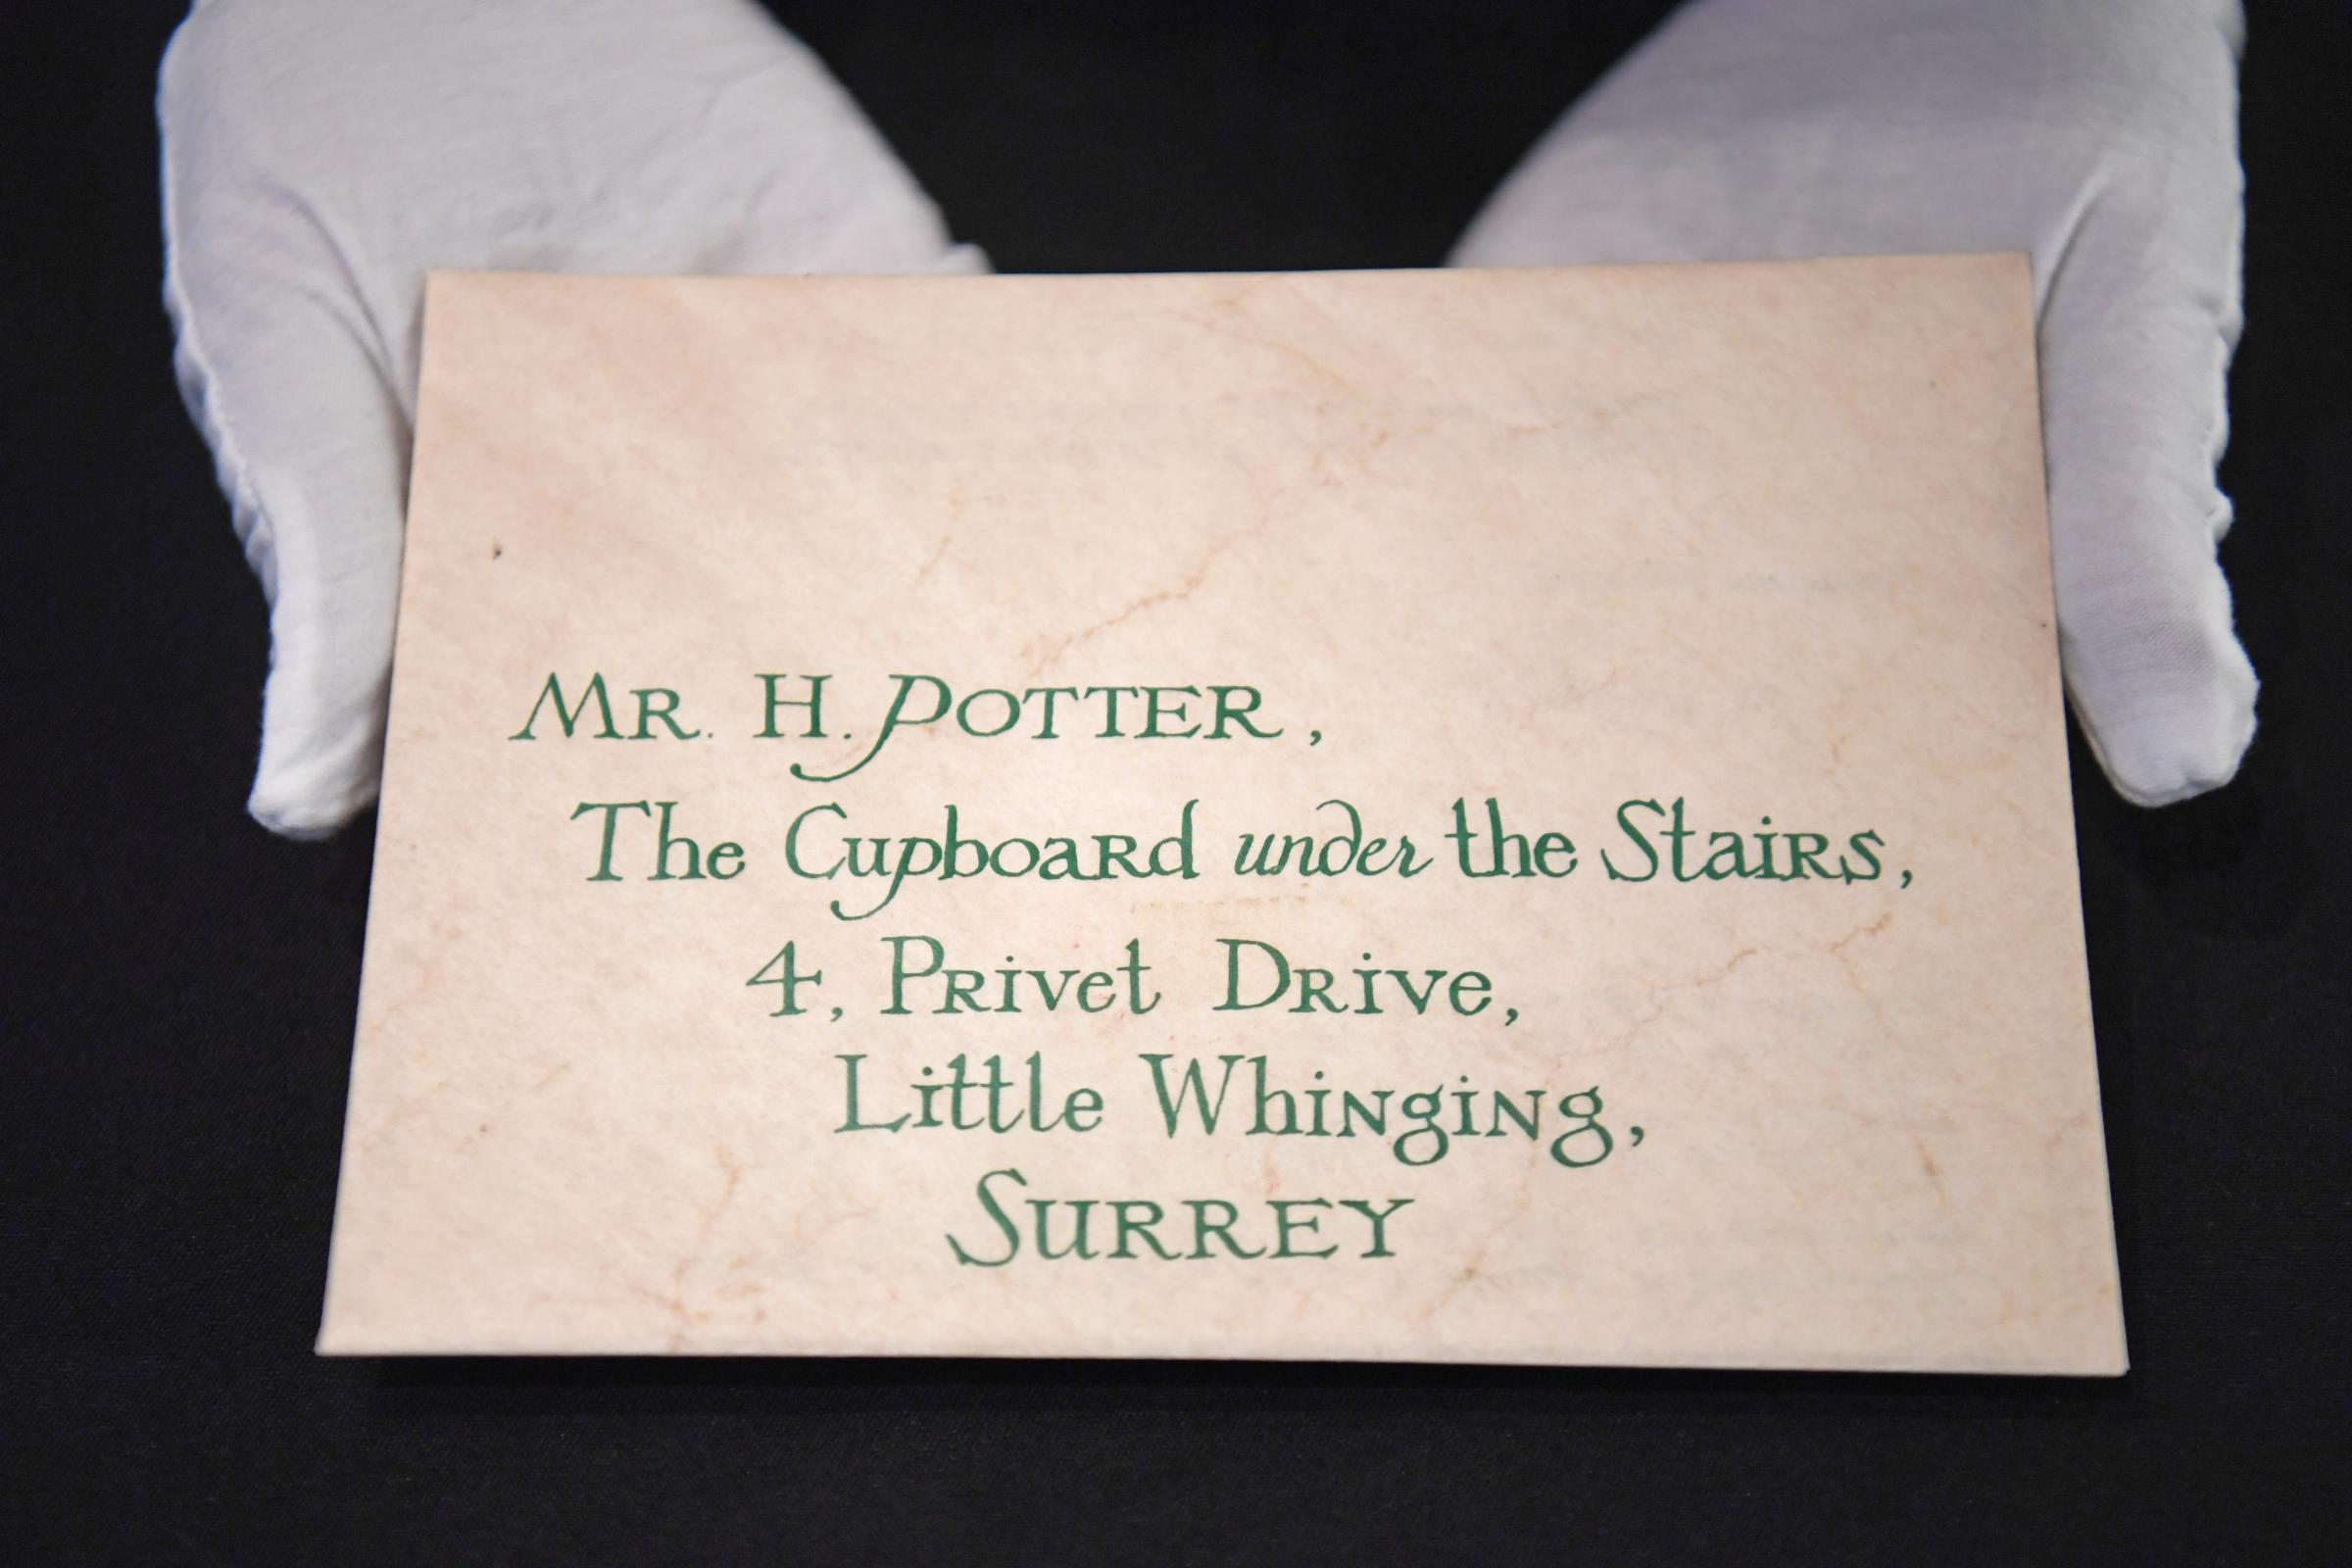 Harry Potter Fans Invited To Bid For Hogwarts Acceptance Letter The Westmorland Gazette